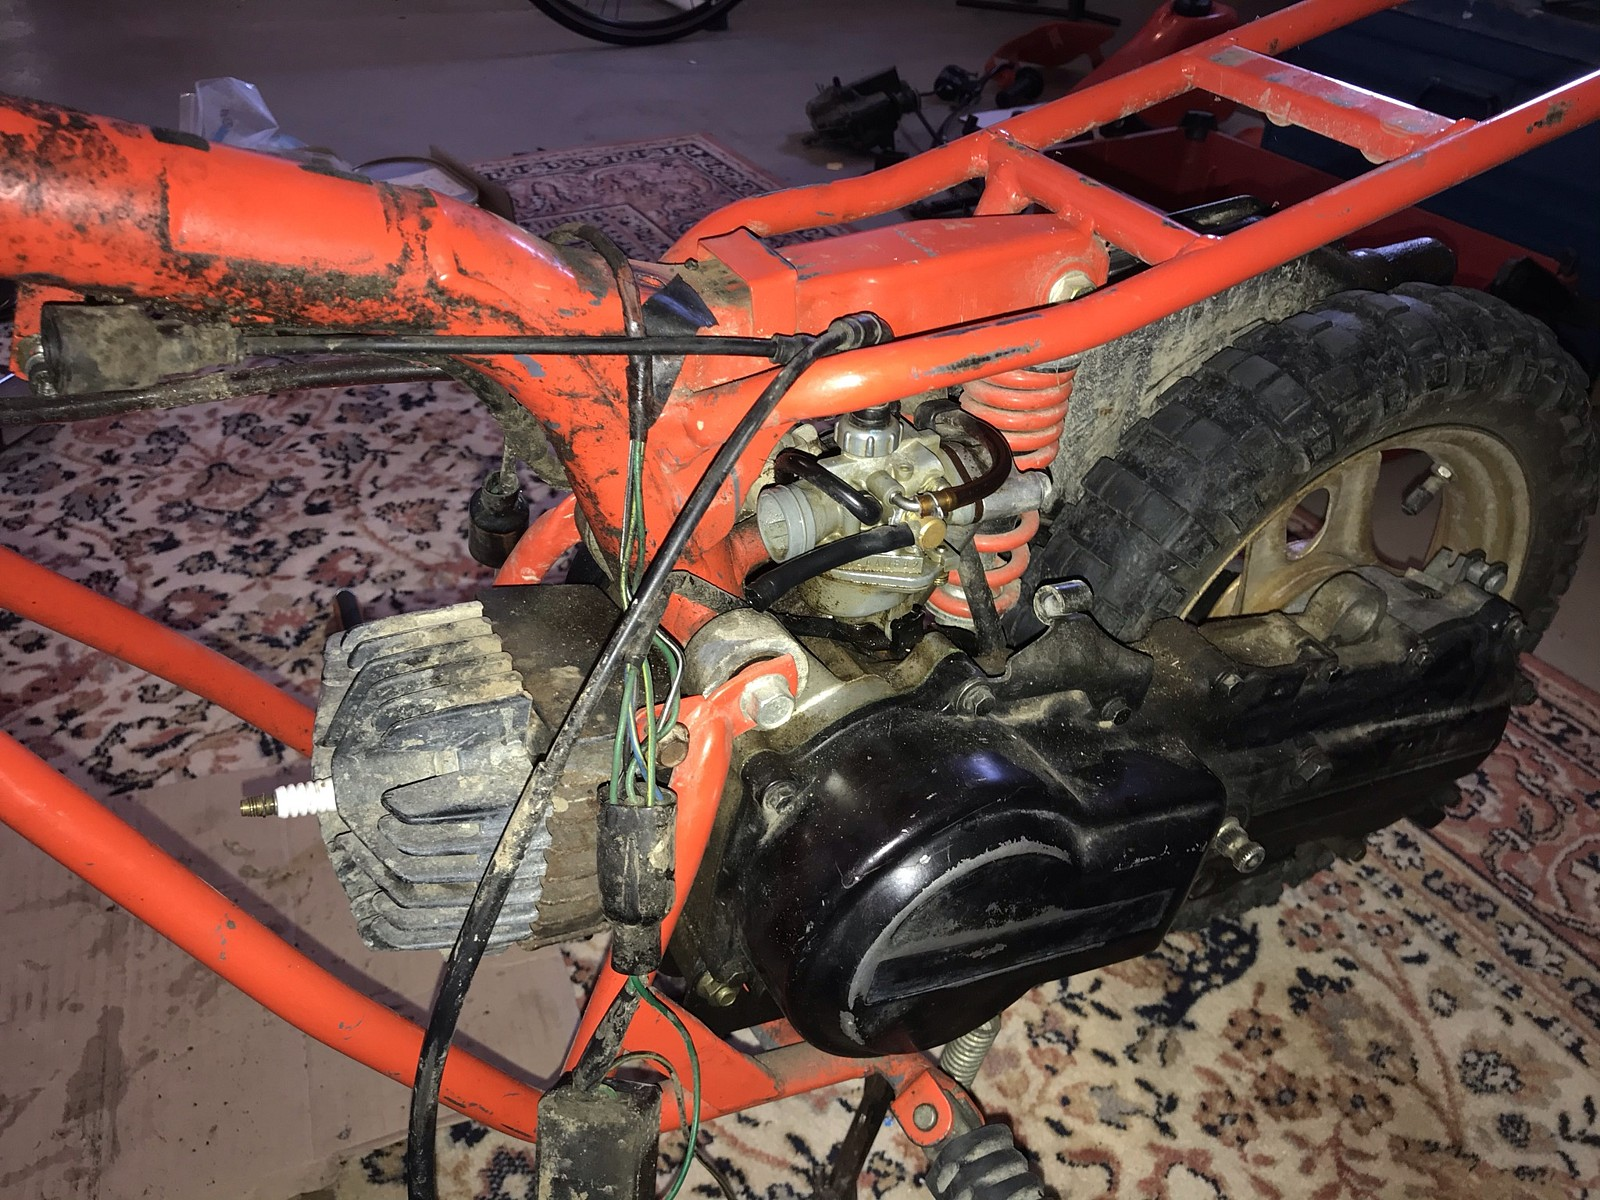 CB9E6545-5928-4CFF-9D20-FCA485A493F2 - Godcho - Motocross Pictures - Vital MX